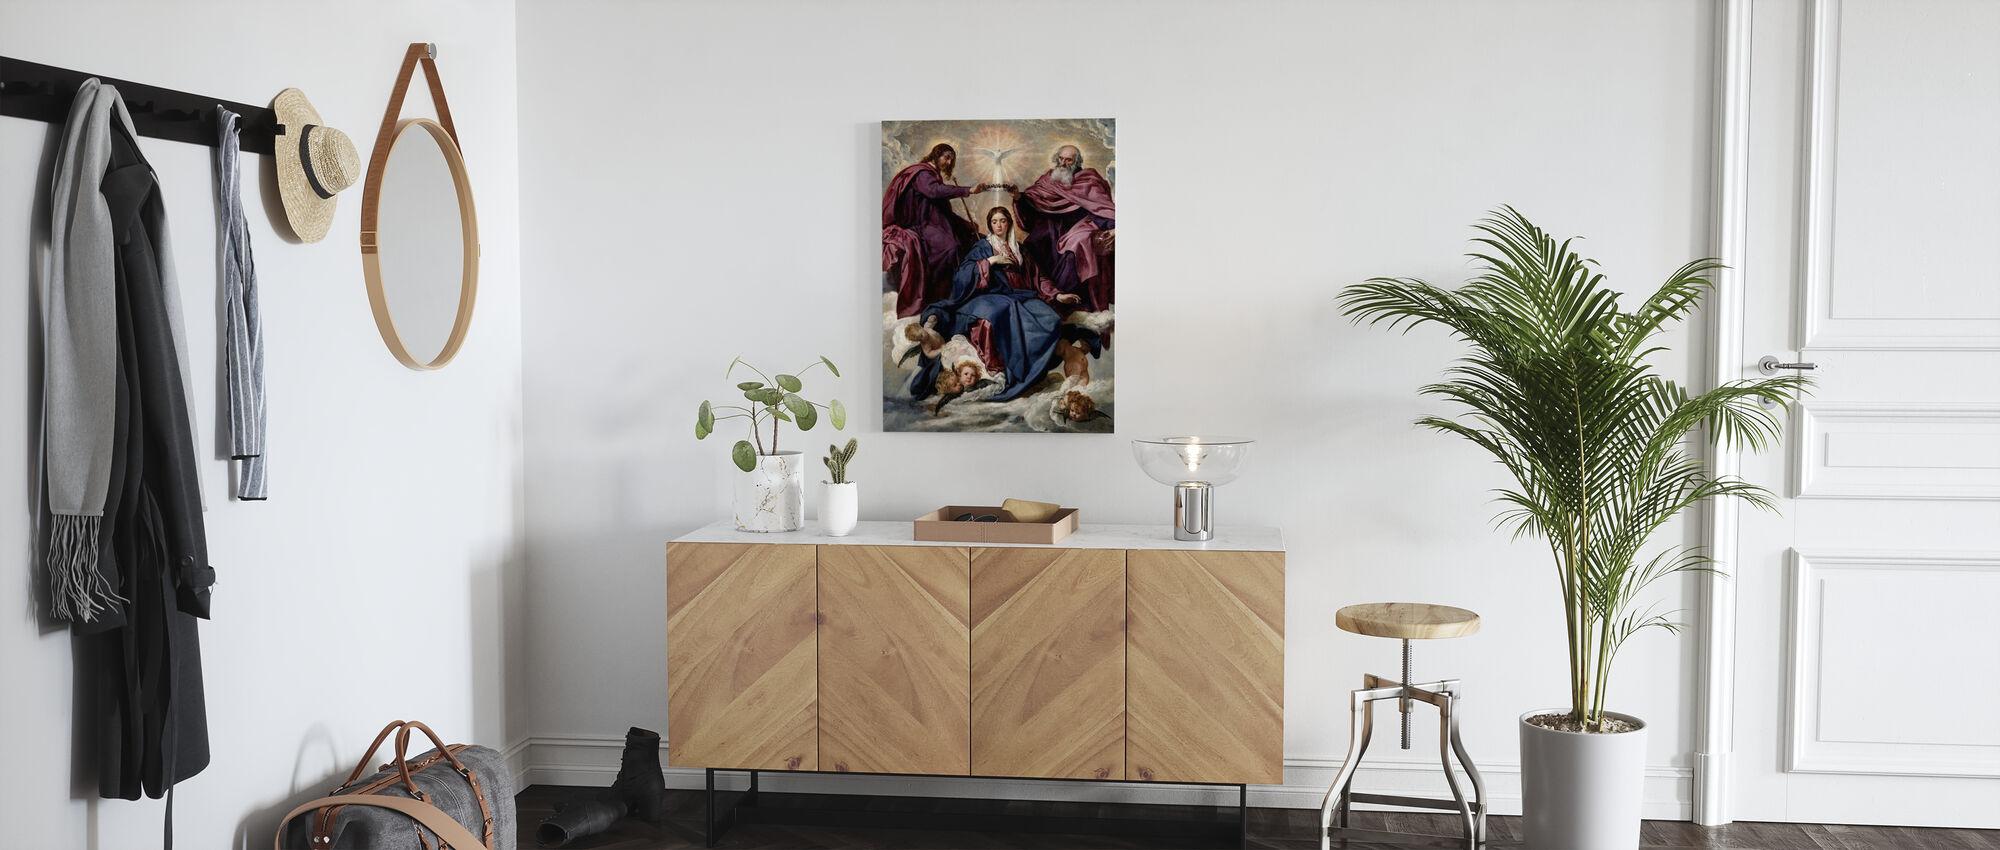 Coronation - Diego Velazquez - Canvas print - Hallway